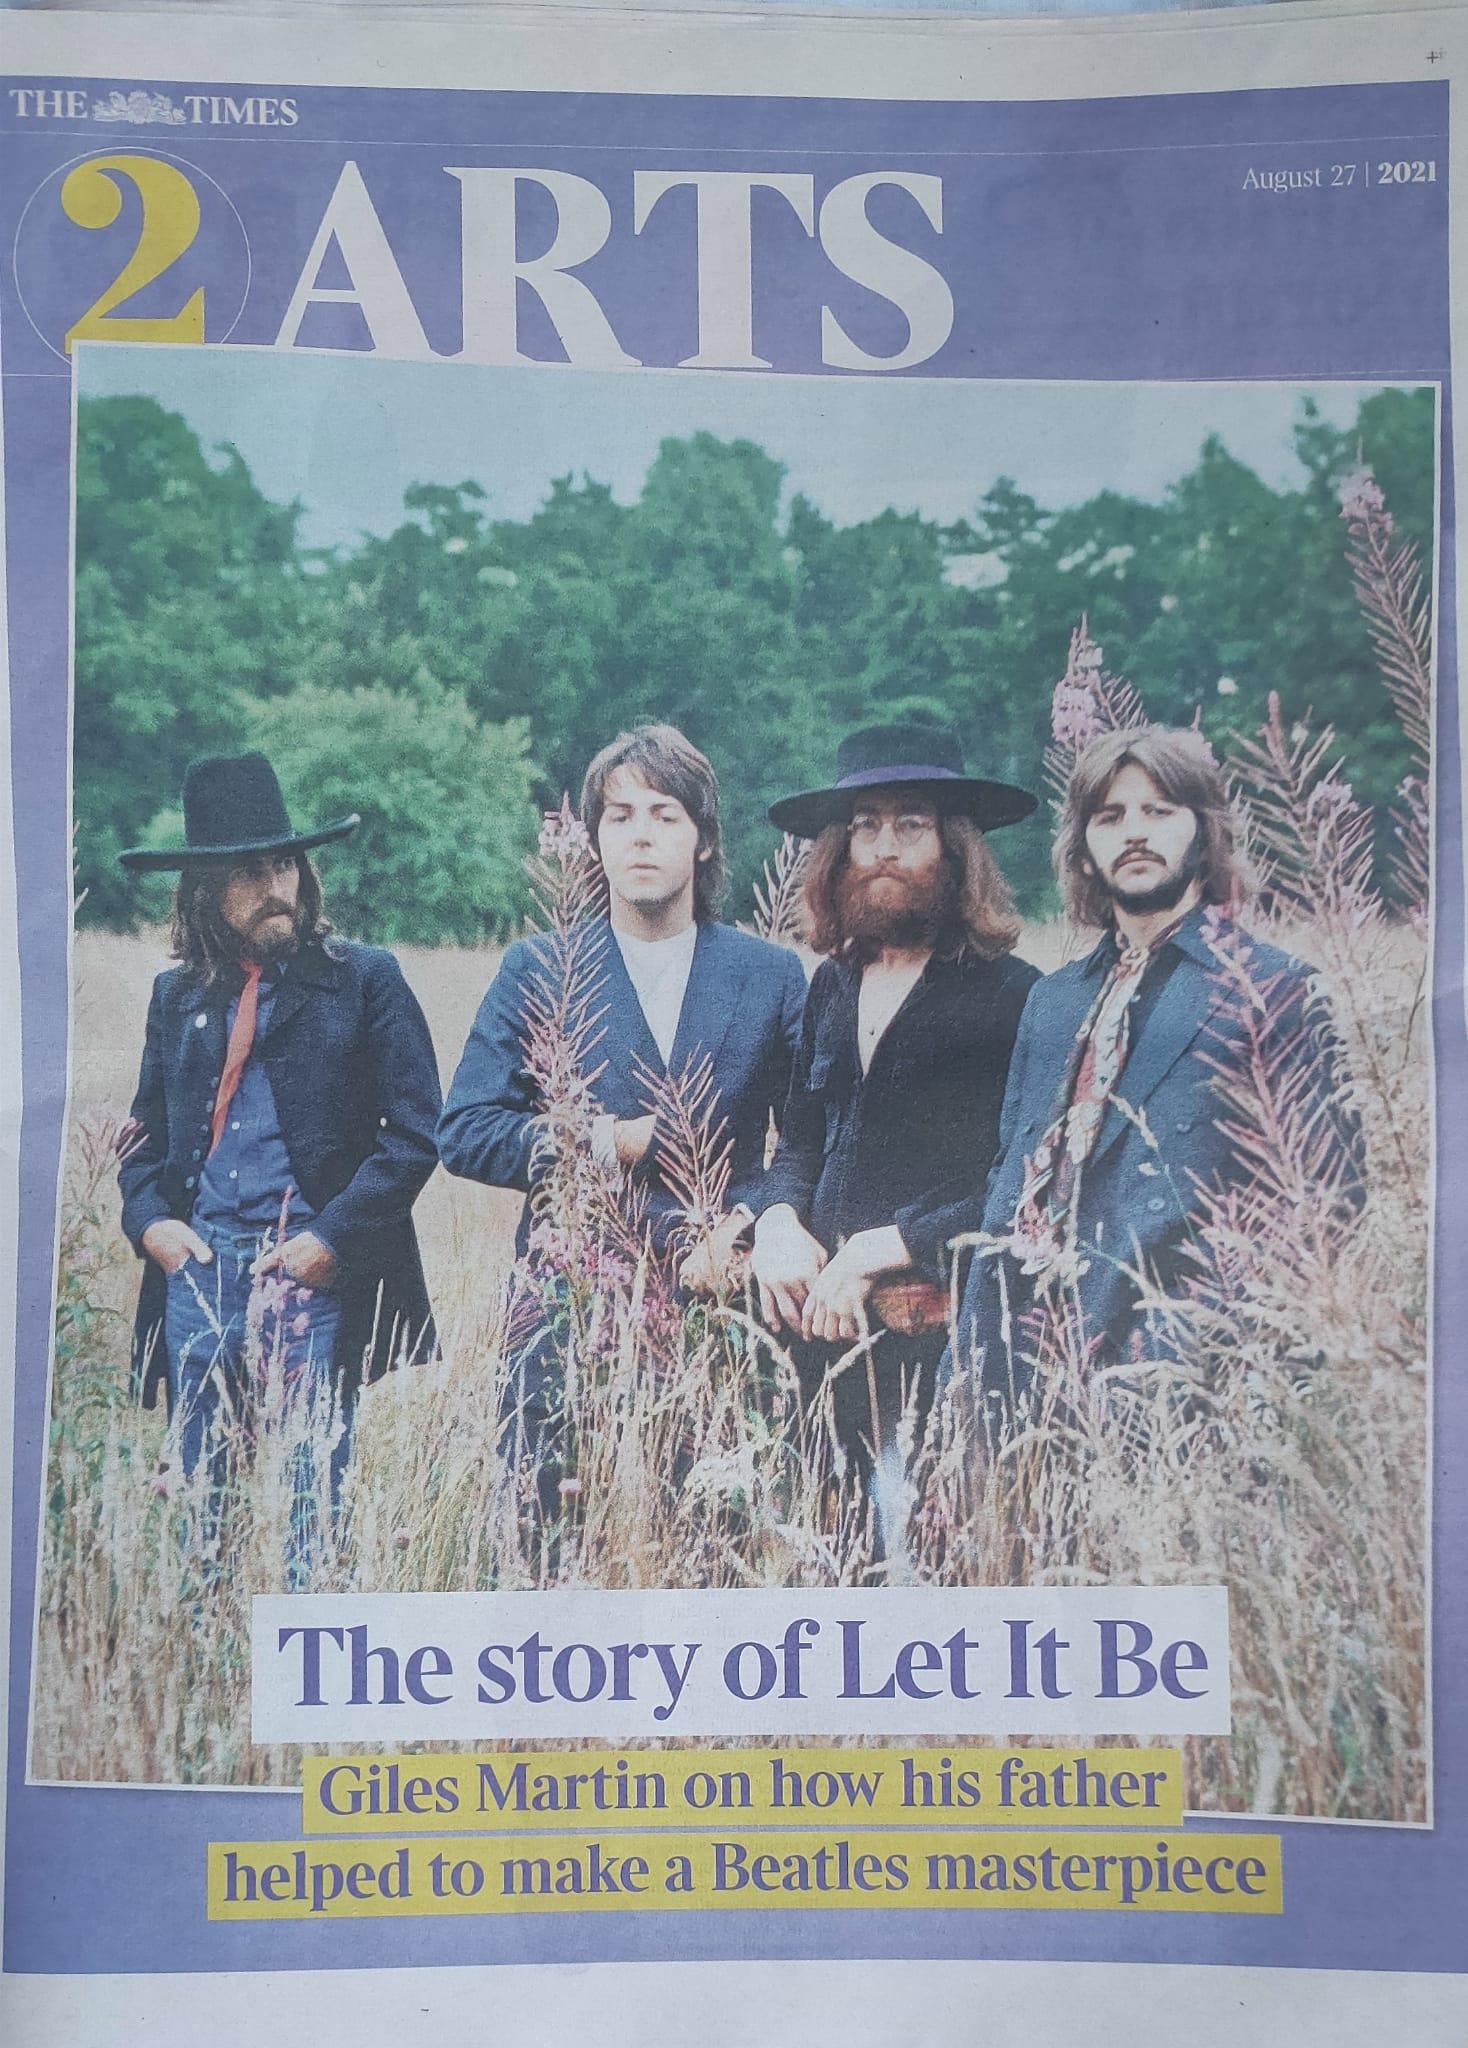 https://beatles.kielce.com.pl/img/The_Times_cover.jpg